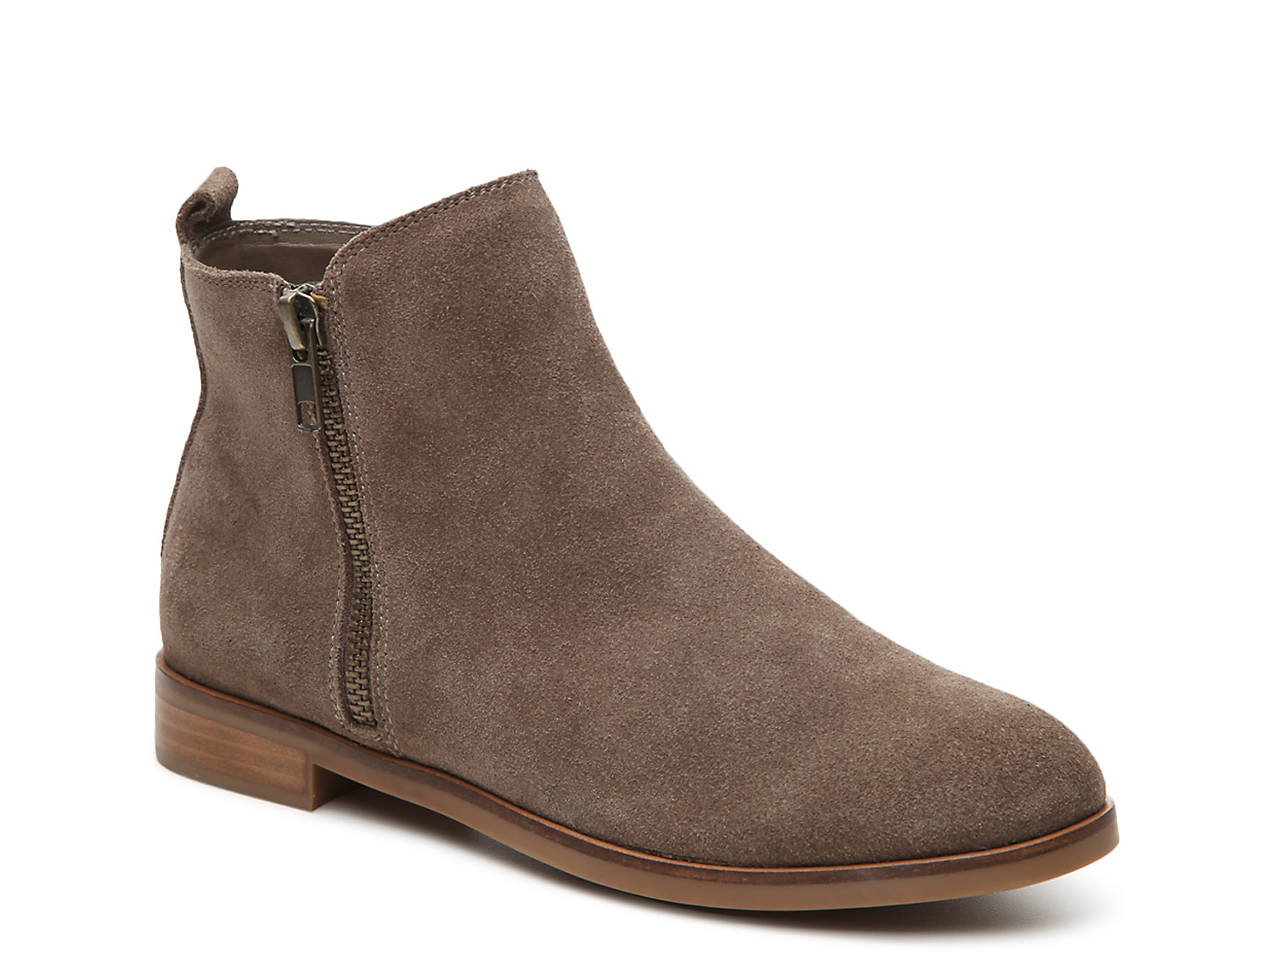 c86784c0755 Steve Madden Reyyna Bootie Women s Shoes